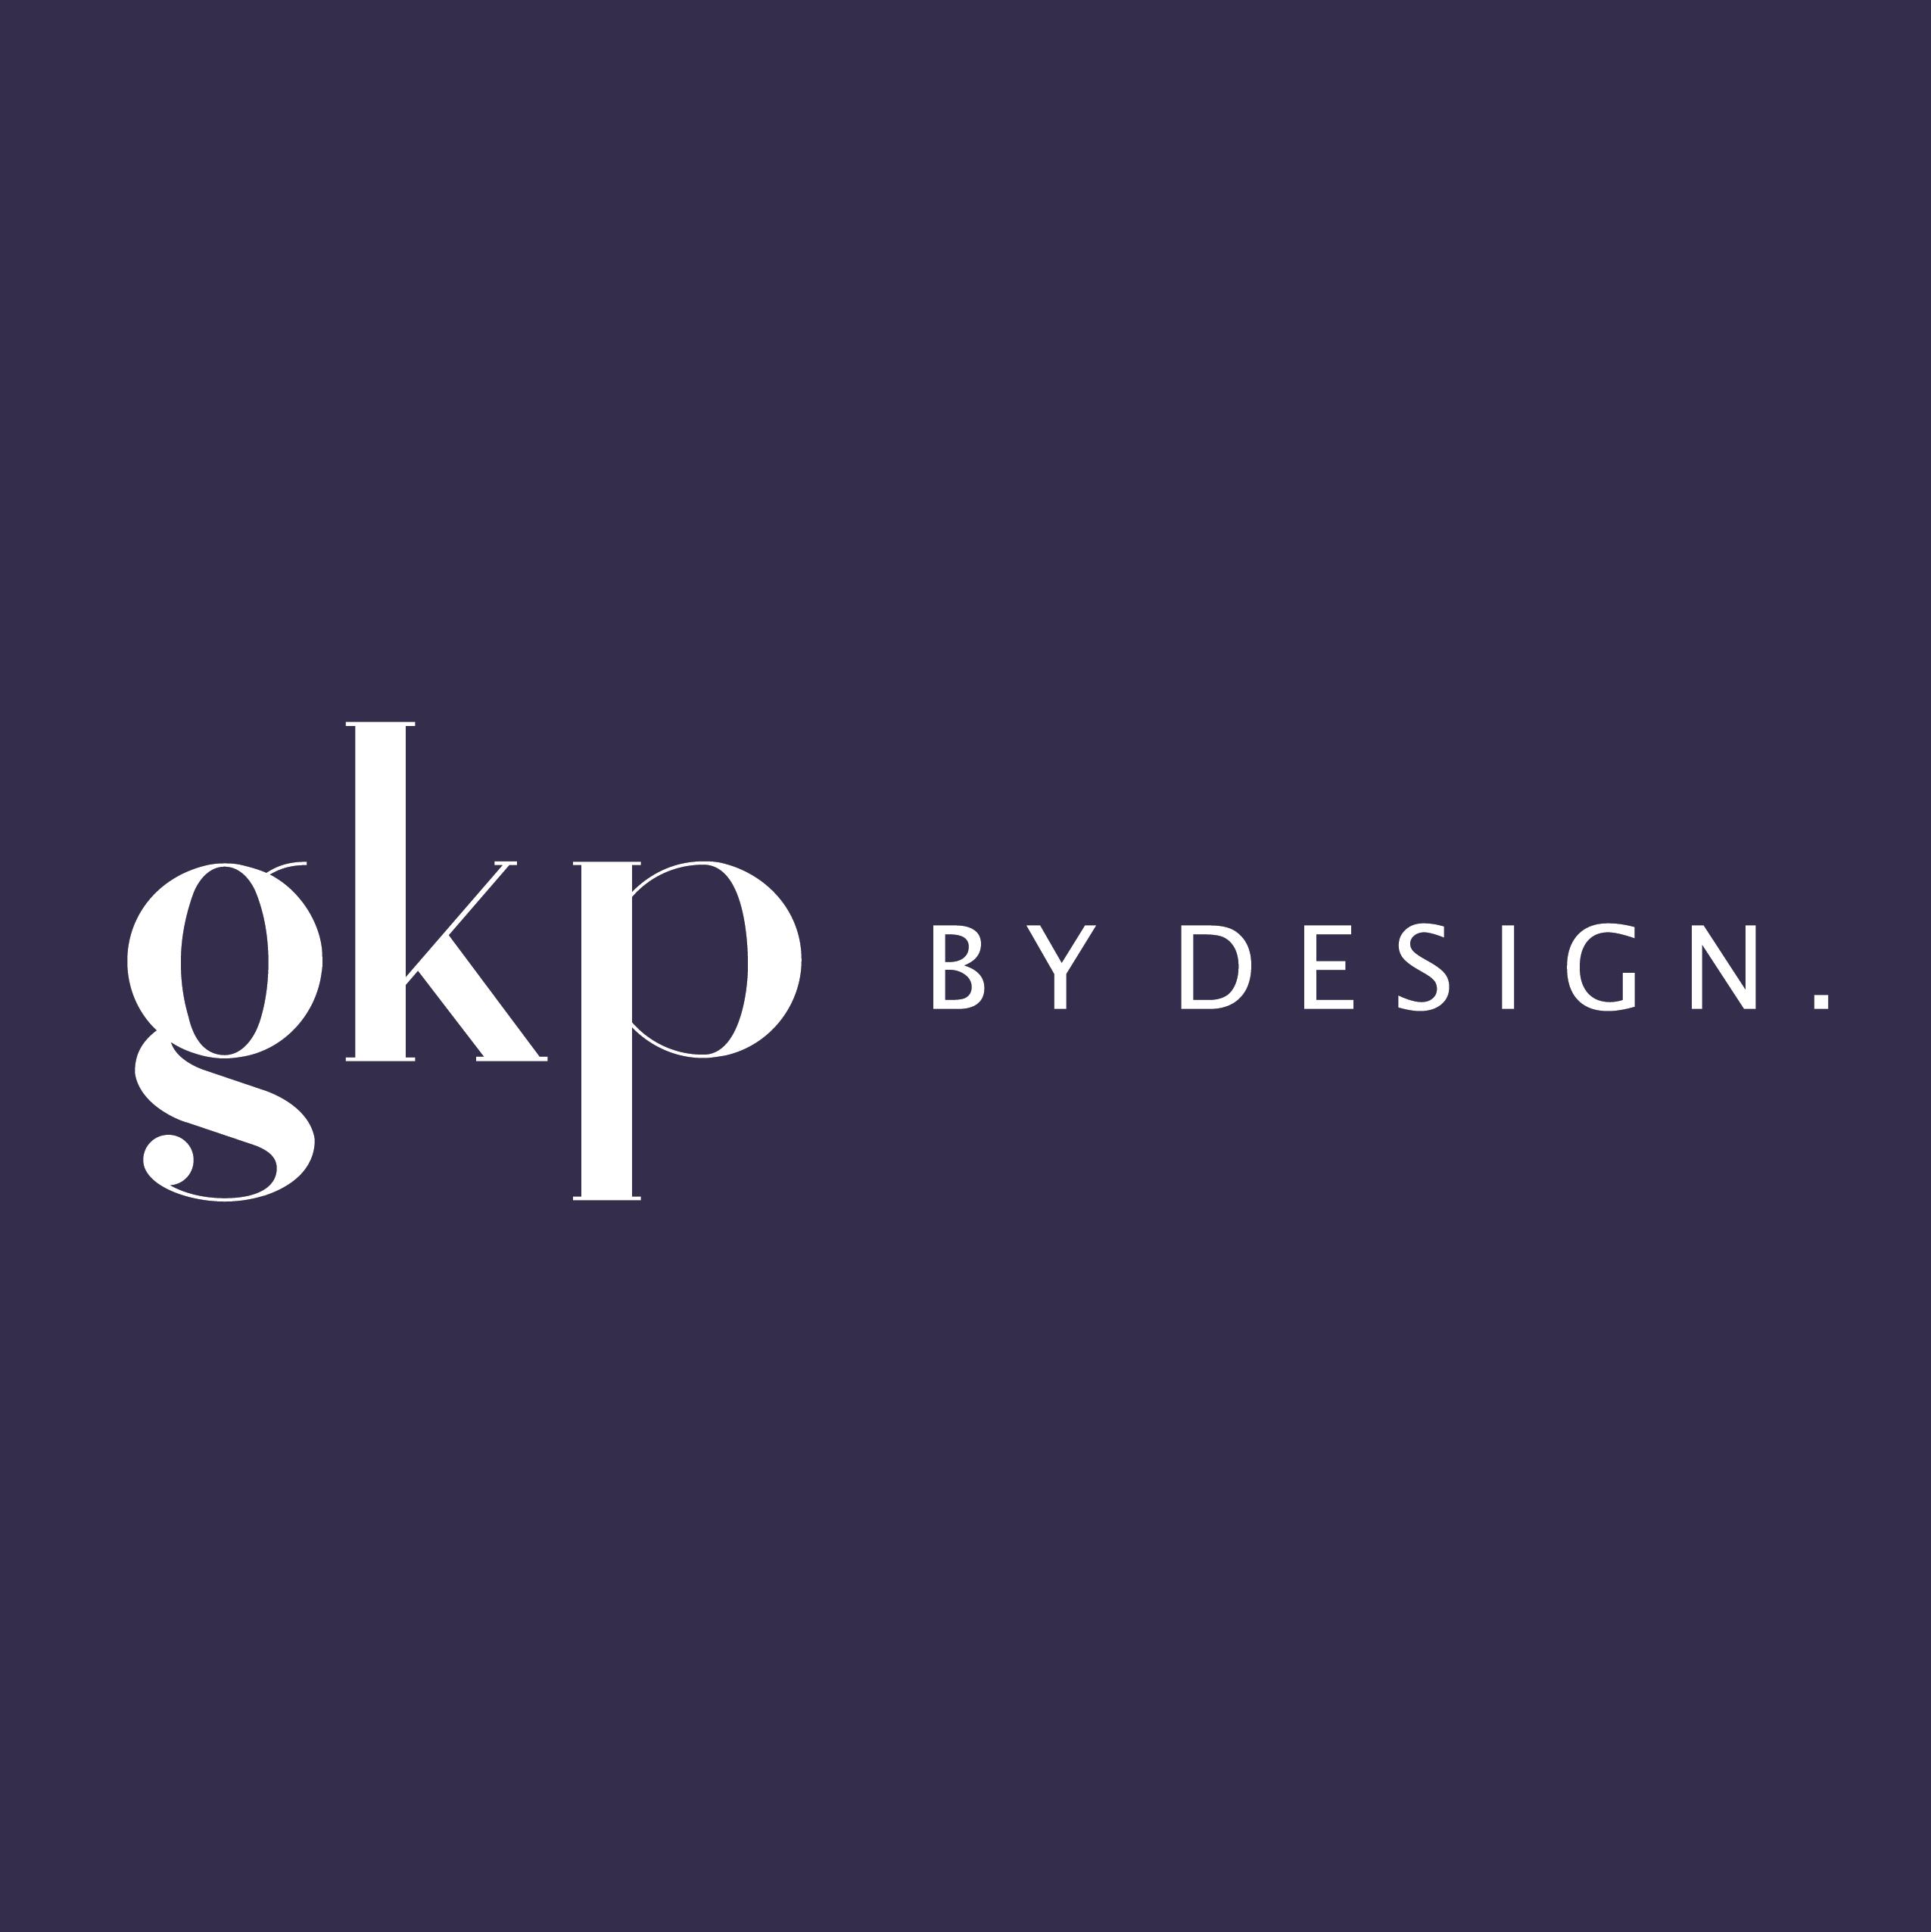 gkp by design. Ltd - London, London EC1V 2NX - 07713 139444   ShowMeLocal.com